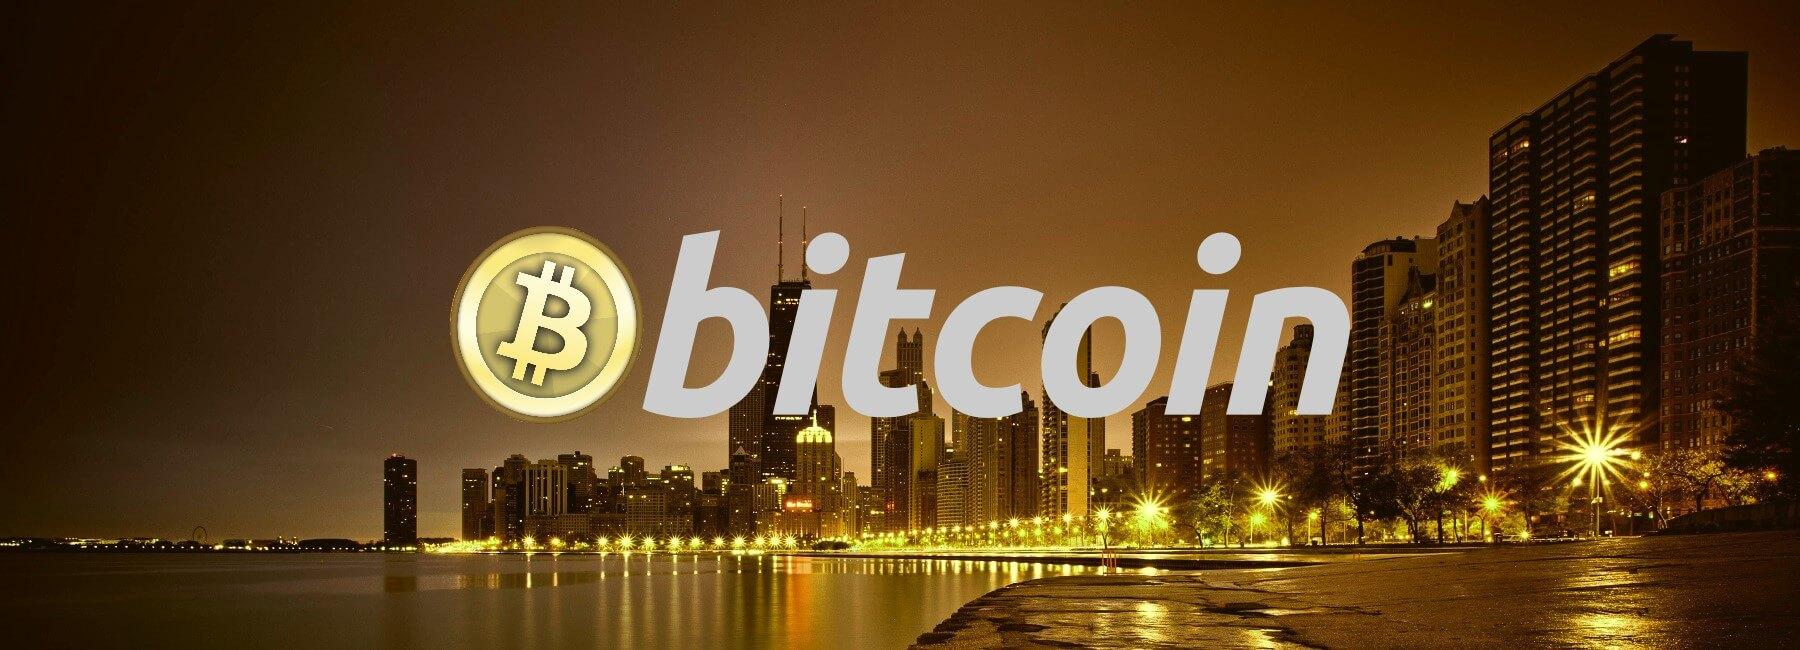 Crypto Analysis: Bitcoin Runs Bullish, Aims to Breach $11,000